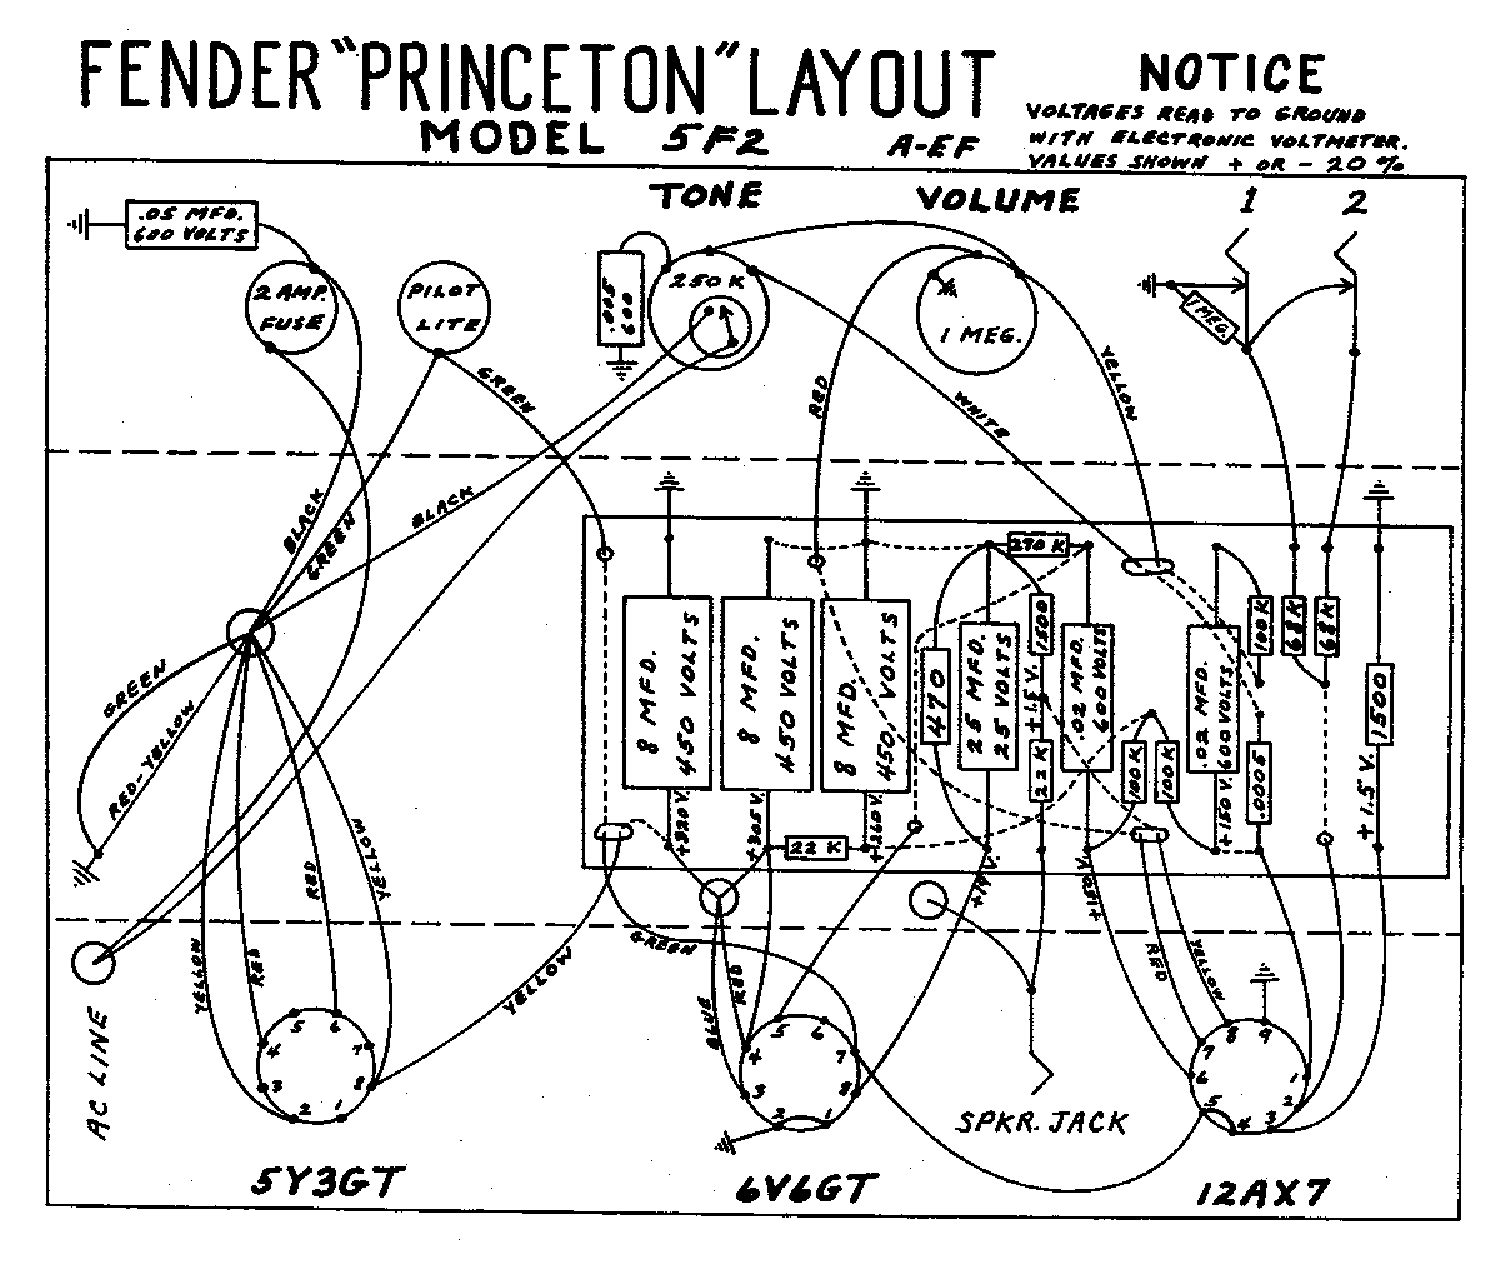 FENDER PRINCETON-5F2-LAYOUT Service Manual download